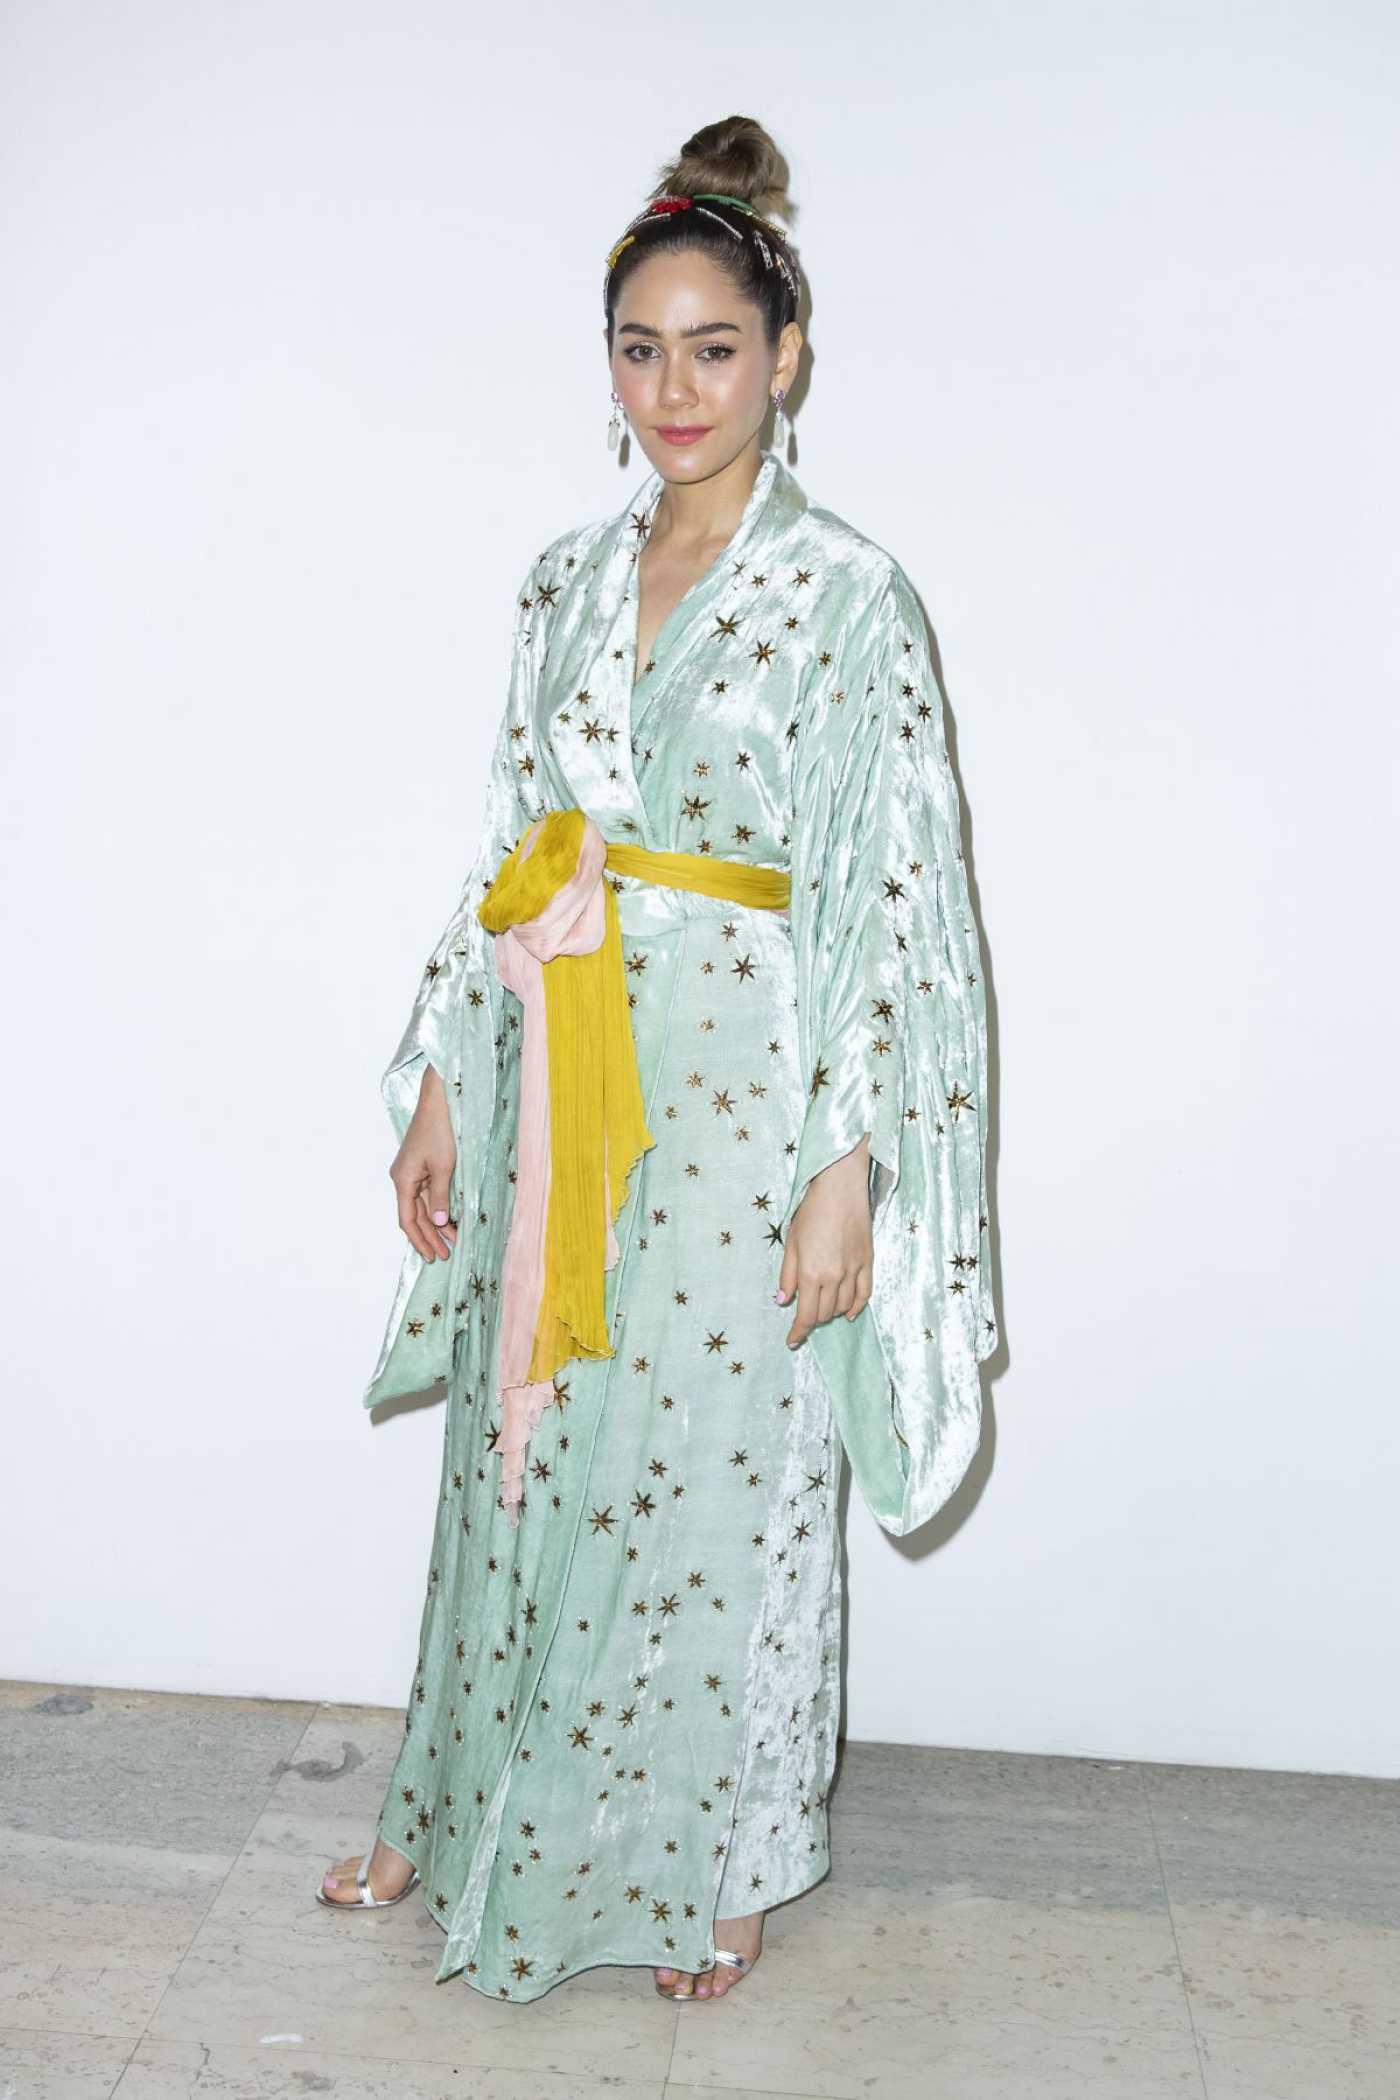 Araya Hargate Attends the Elie Saab Fashion Show During 2019 Paris Fashion Week in Paris 07/03/2019